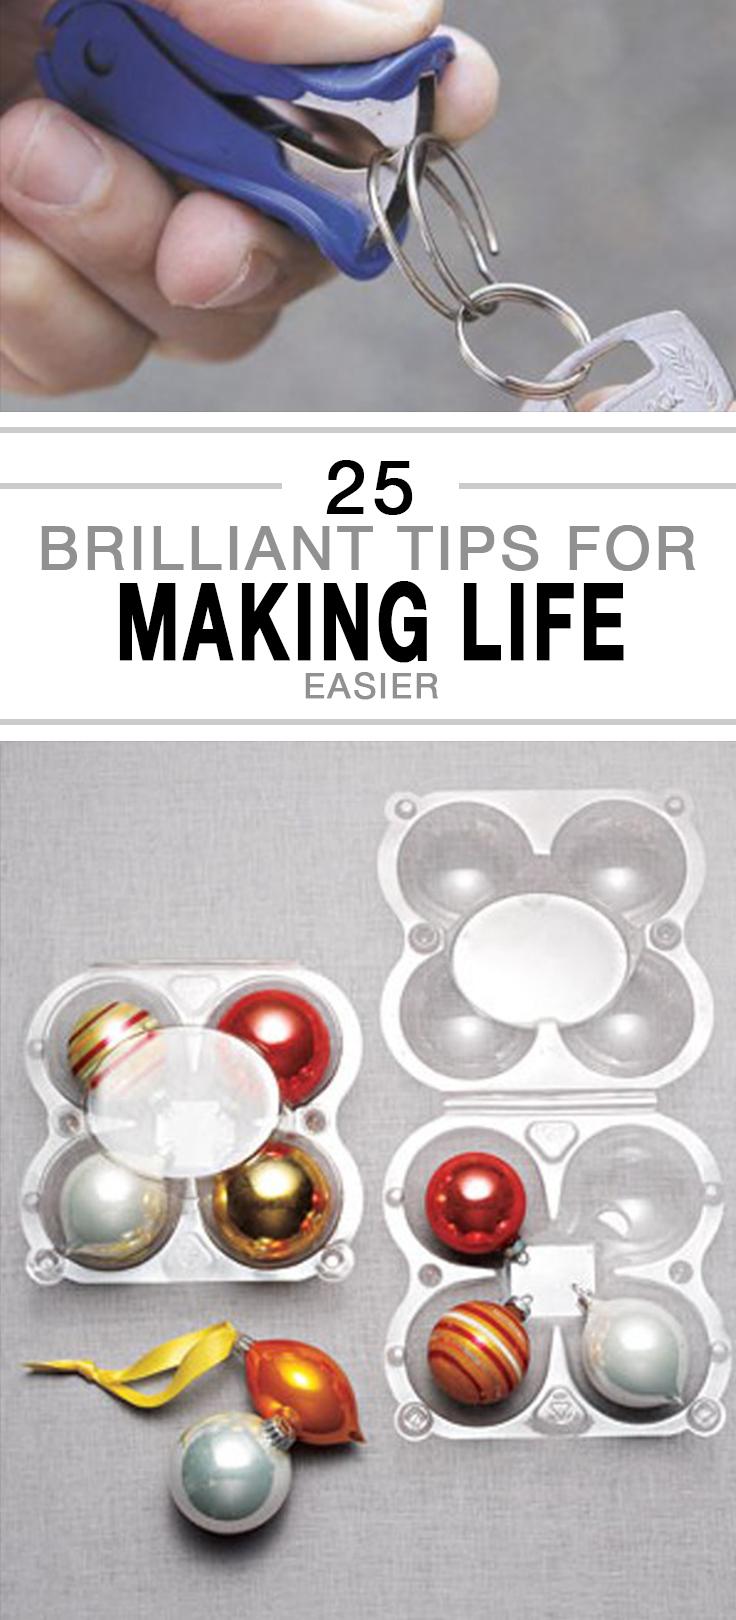 Life hacks, make your life easier, life tips, popular pin, home hacks, cleaning hacks, cooking hacks.